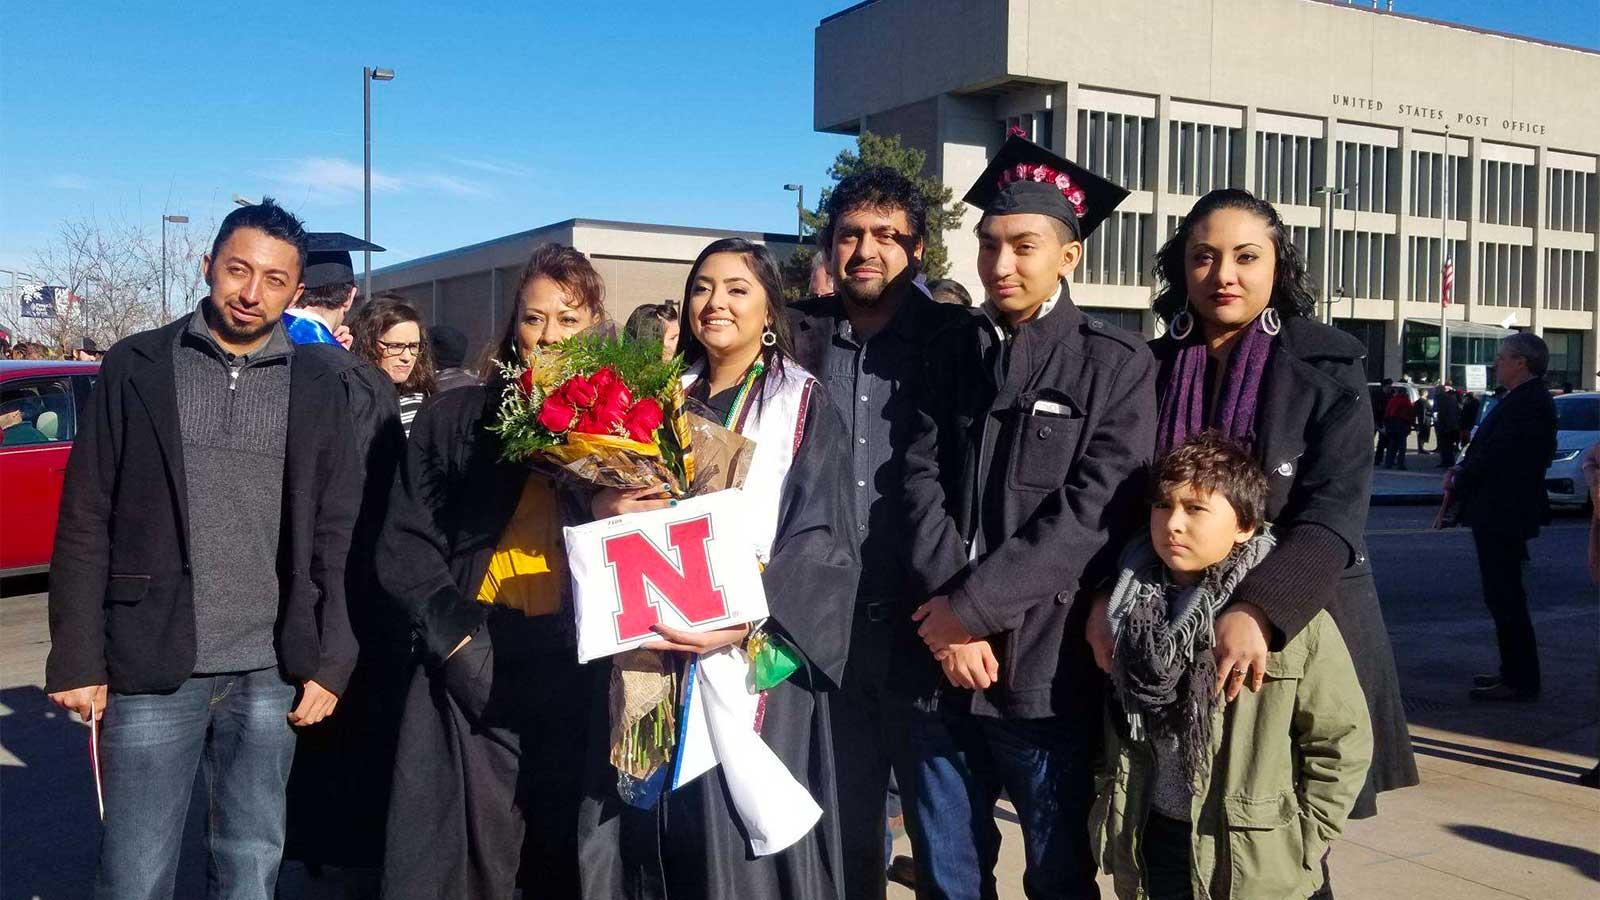 Yajaira graduating from UNL alongside her family.